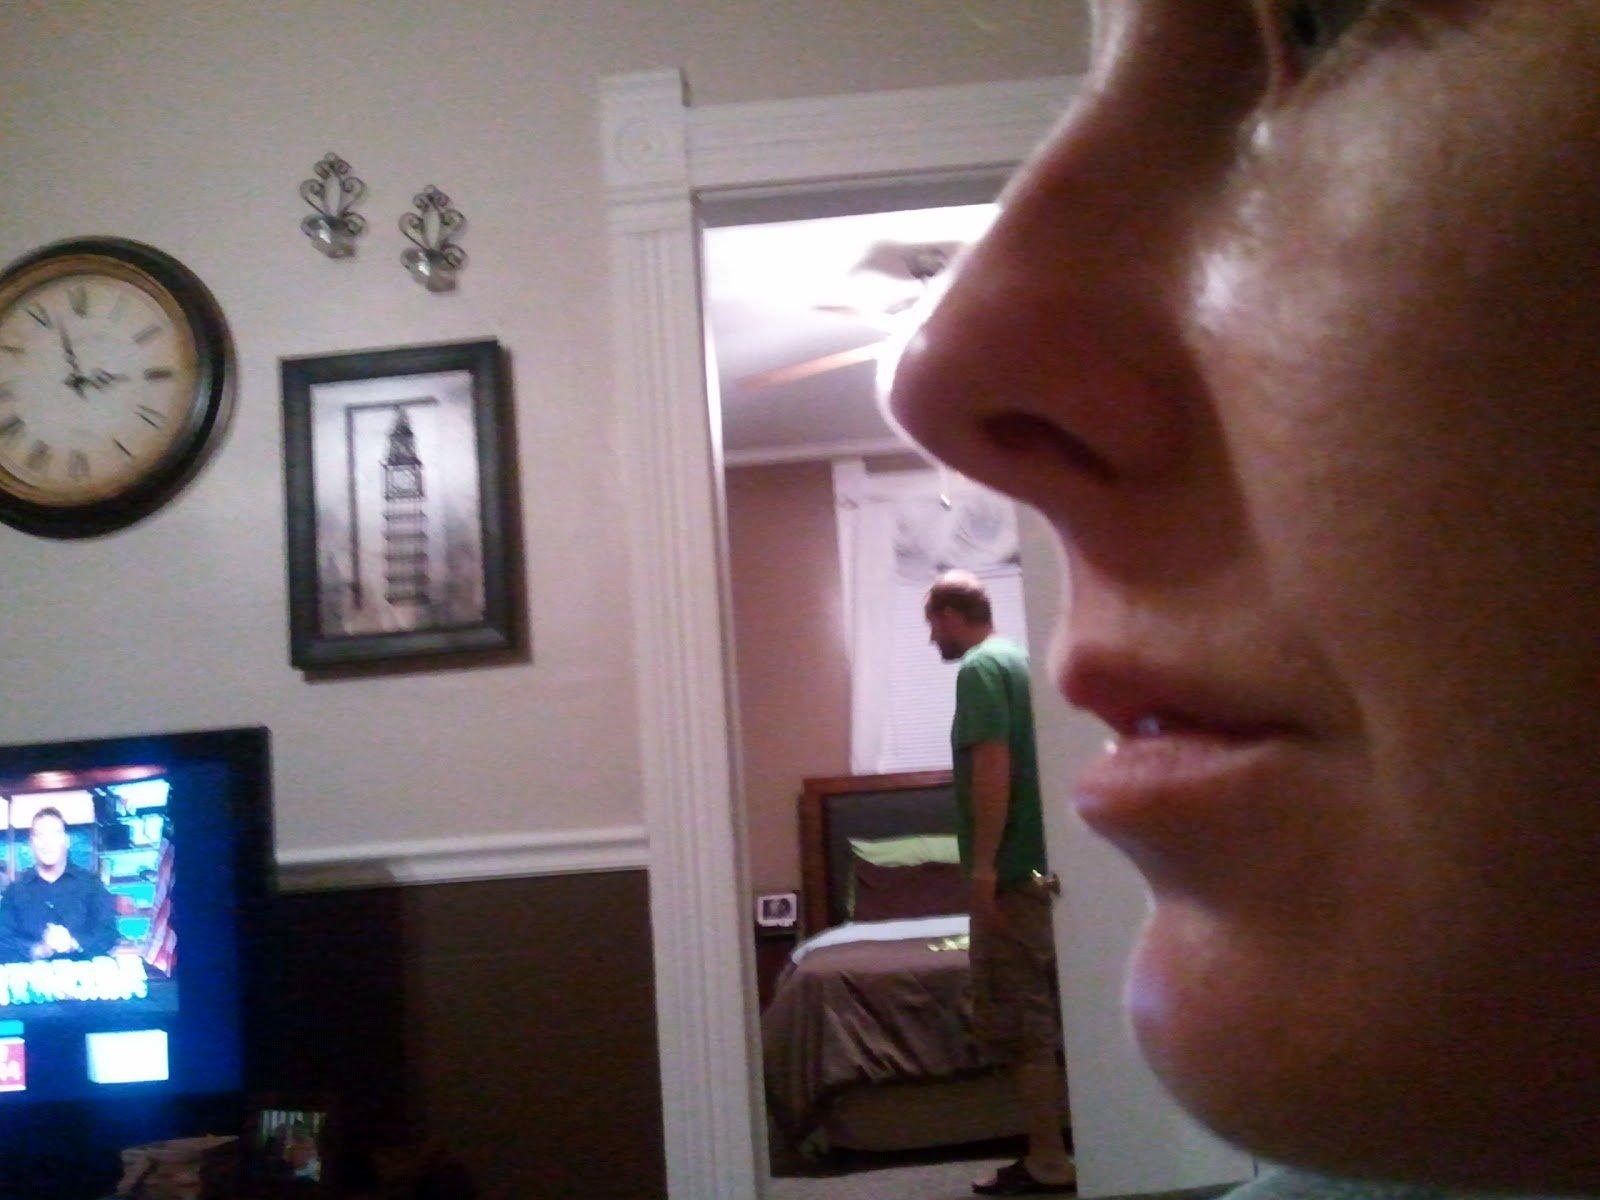 Deviated Septum/Choanal Atresia Surgery: June 2012 I Got My Depo 1/20 When Am I Due